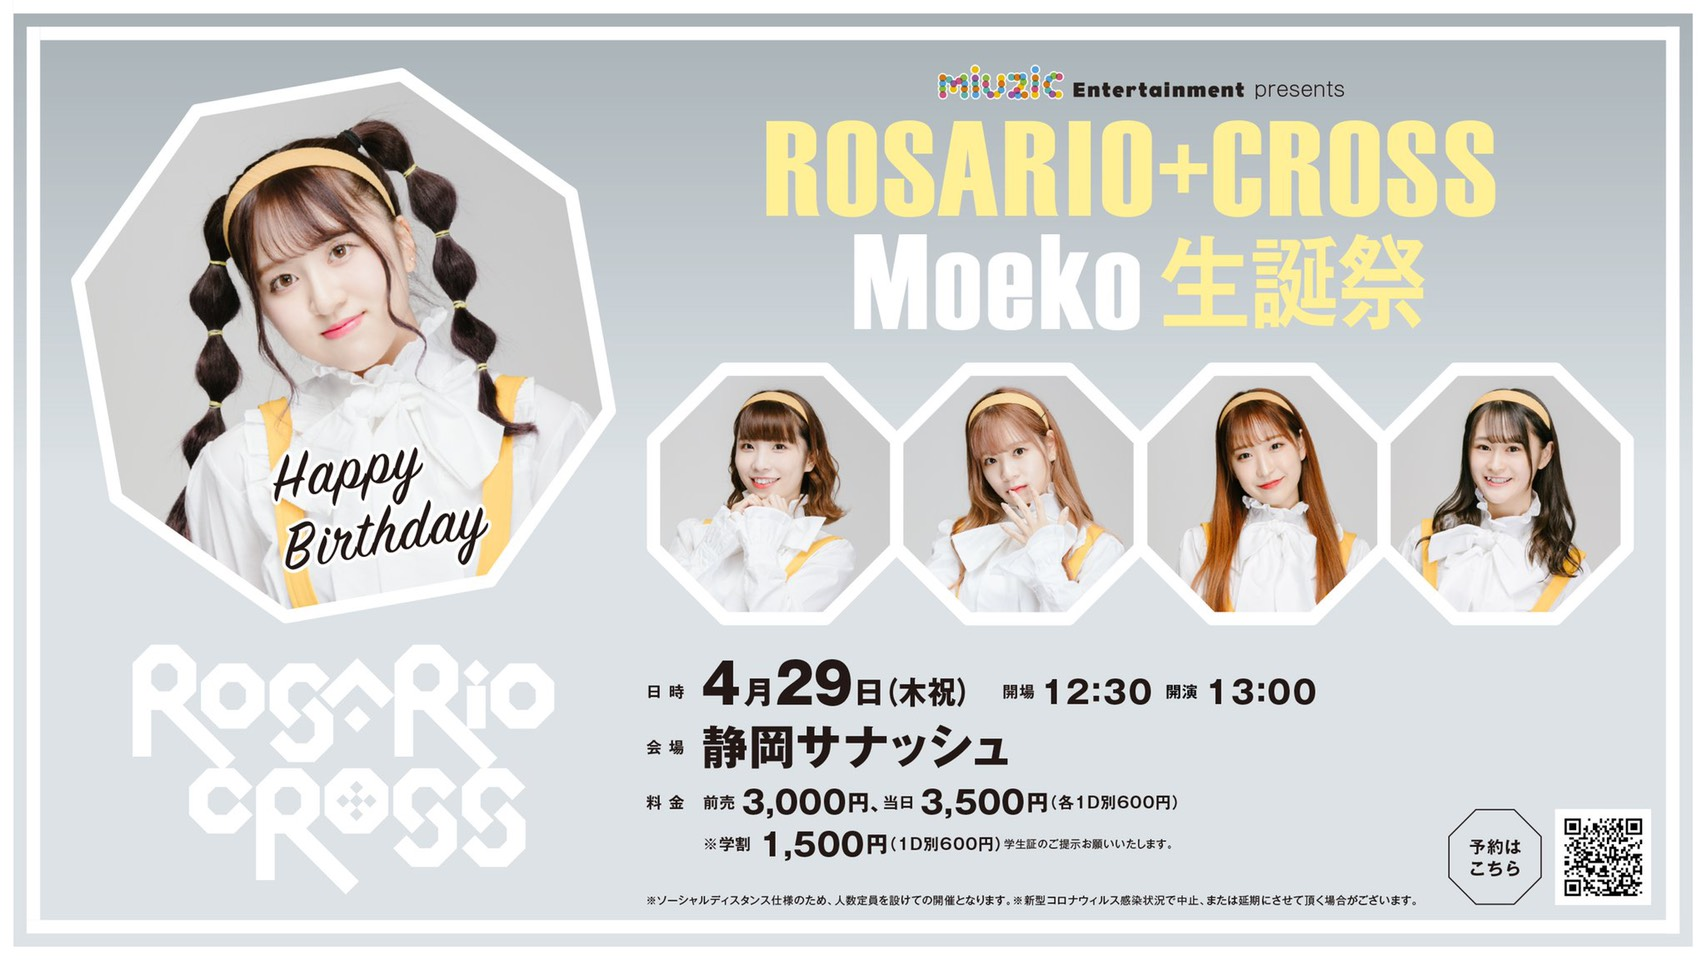 4/29(木祝)【ROSARIO+CROSS】昼公演「ROSARIO+CROSS Moeko生誕祭」